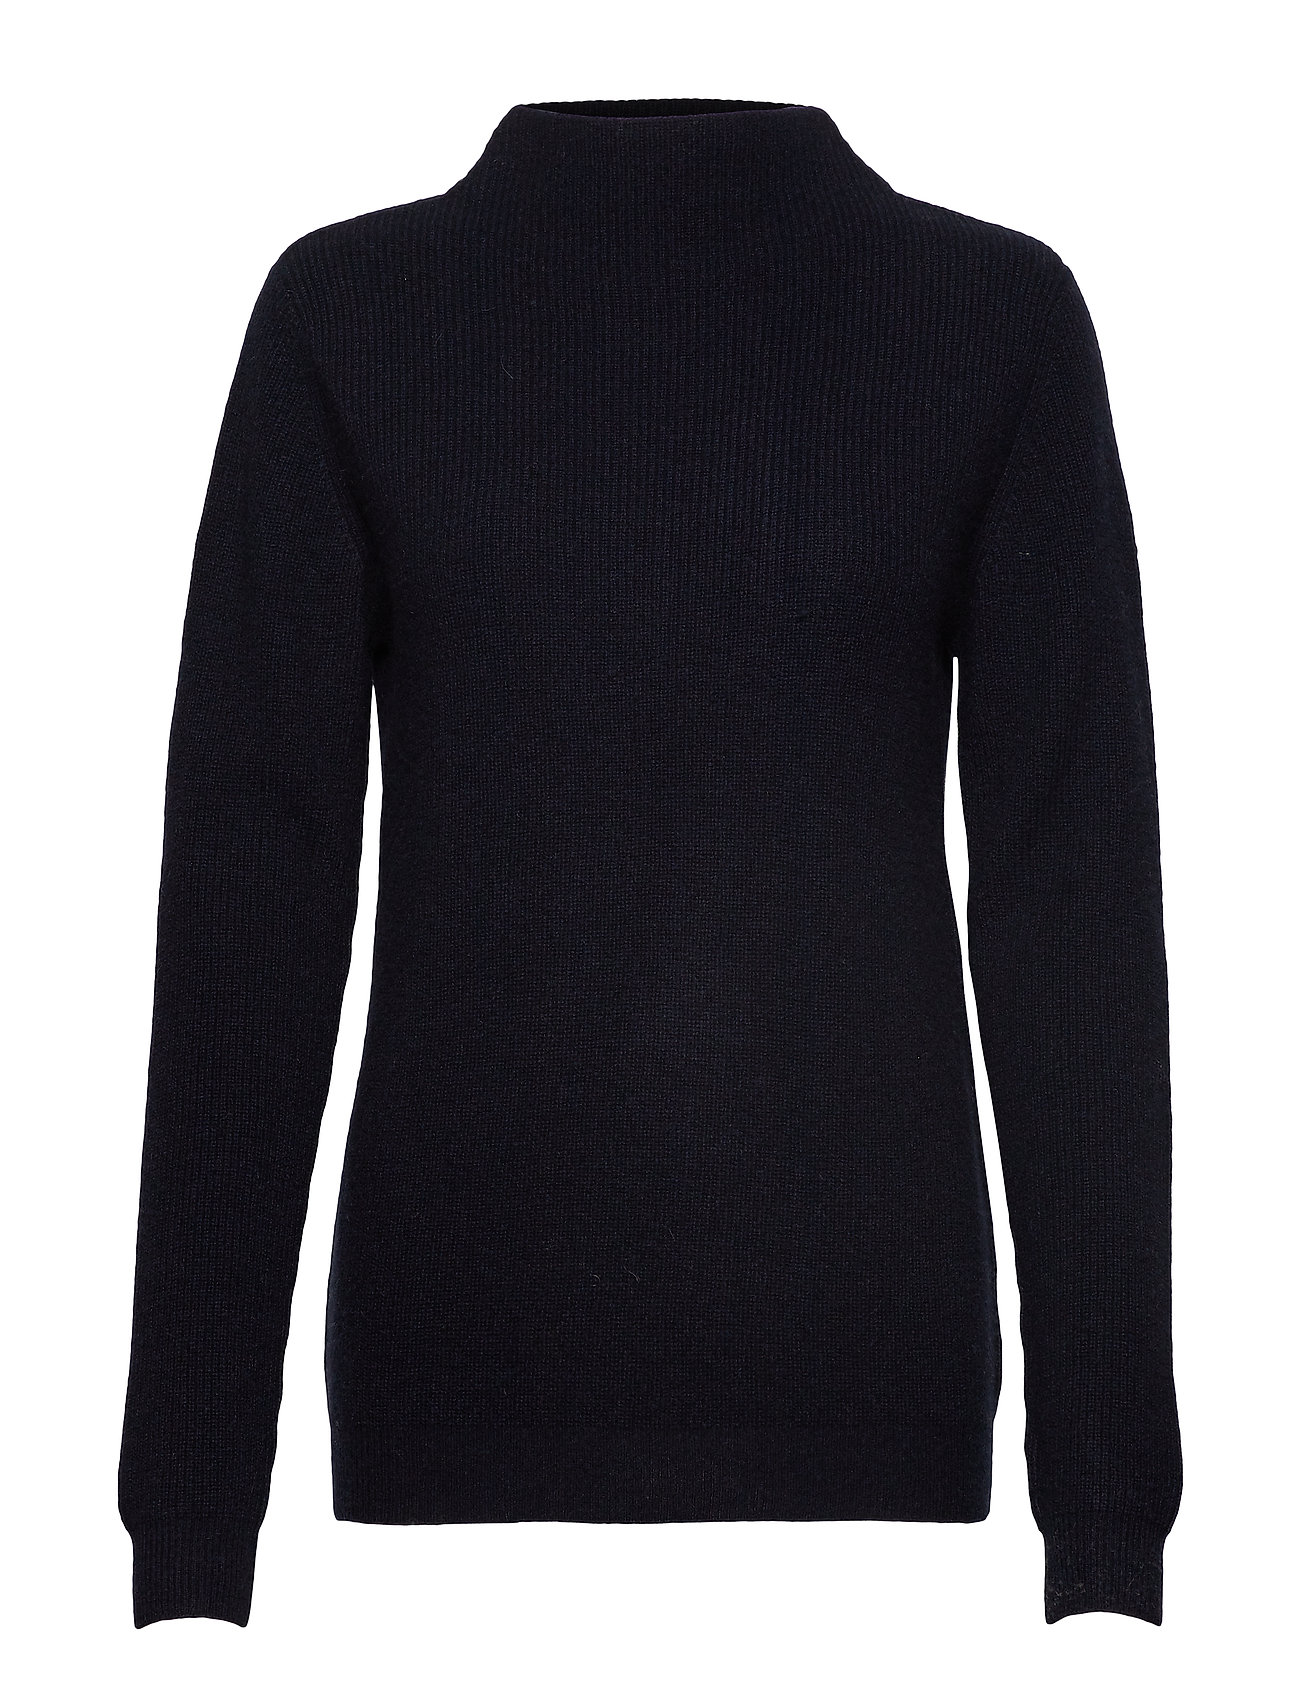 Davida Cashmere Rib Funnel Neck Sweater - NAVY